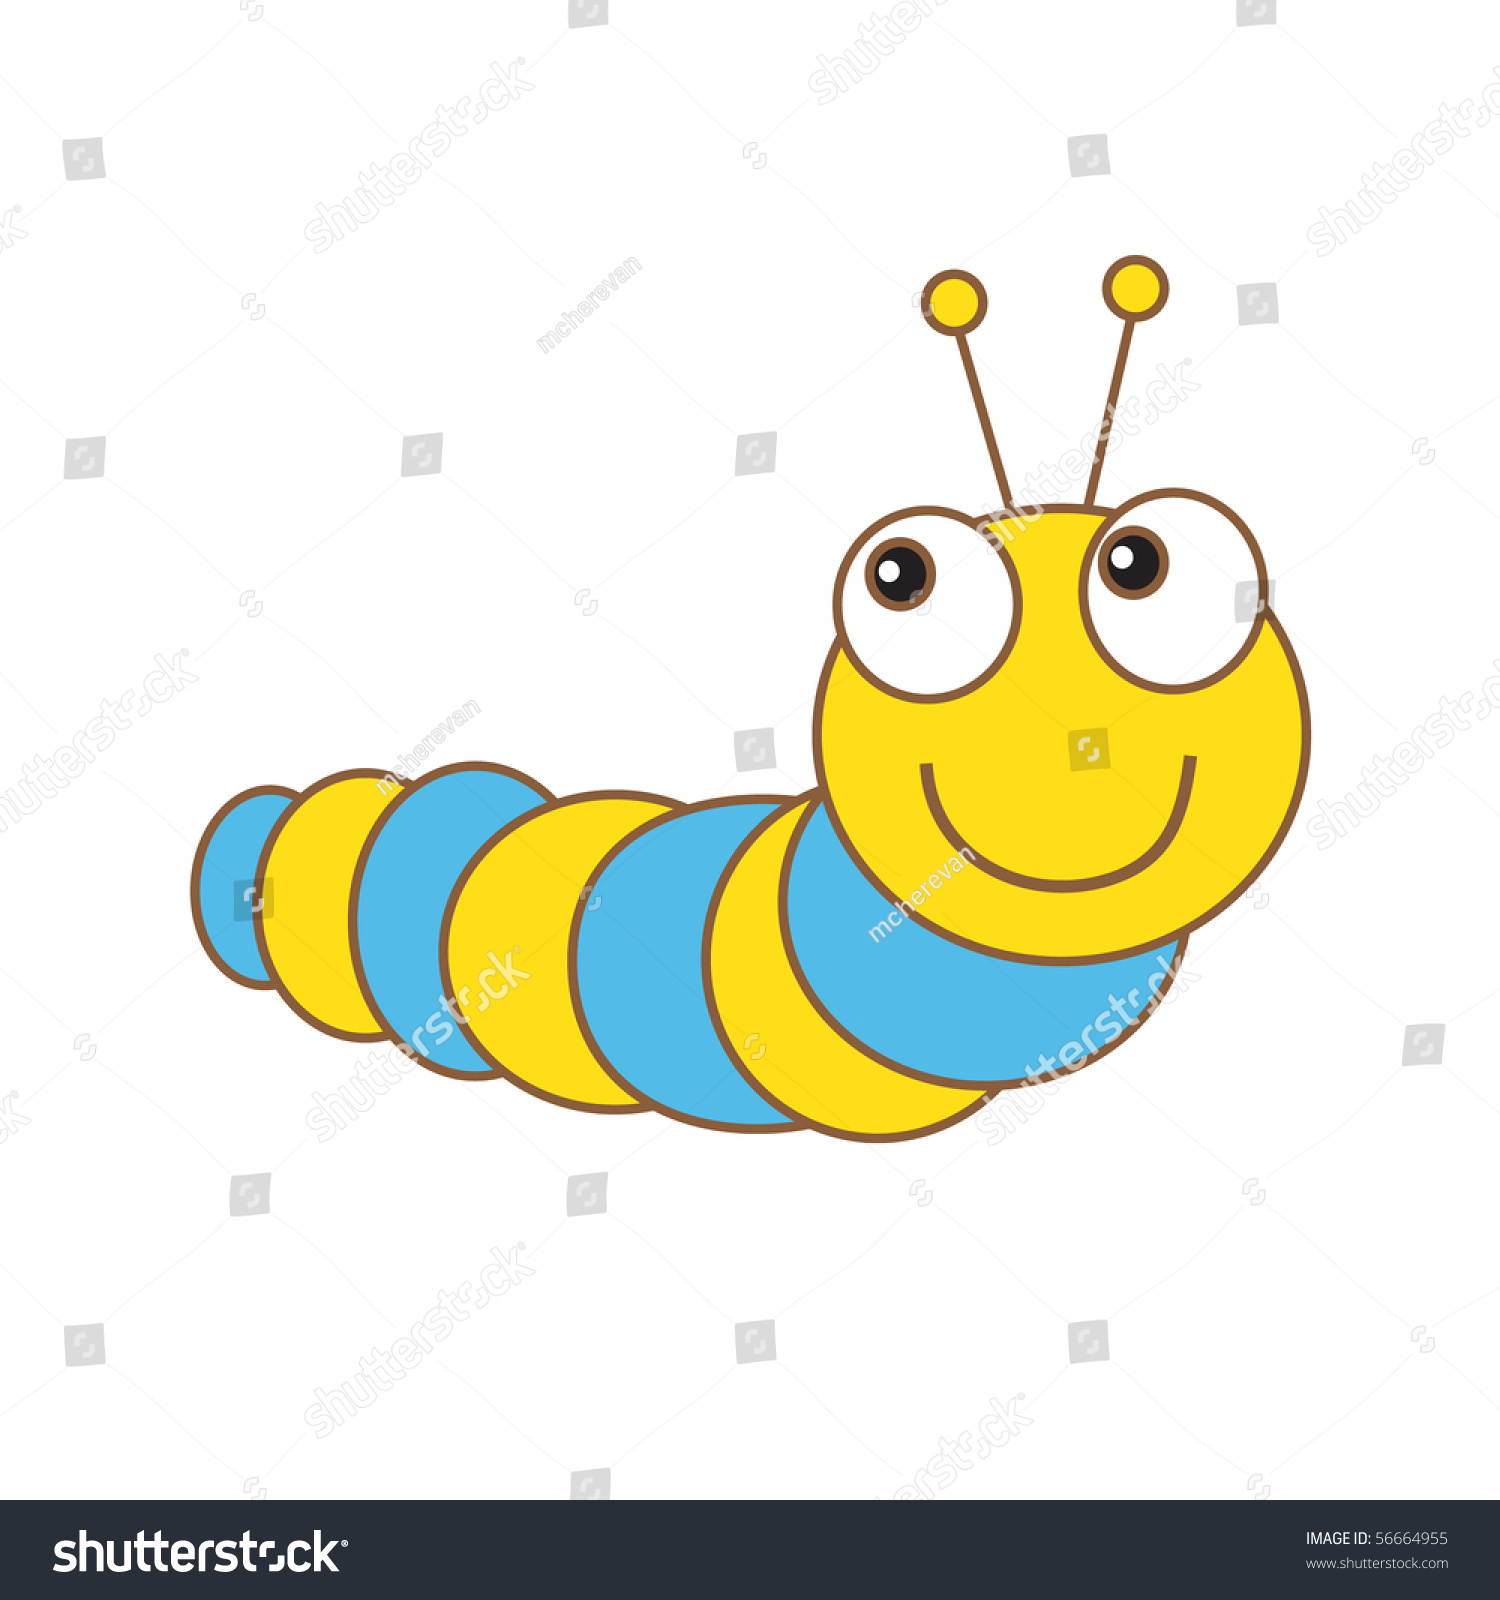 Caterpillar Stock Vector Illustration 56664955 : Shutterstock Гусеница Вектор